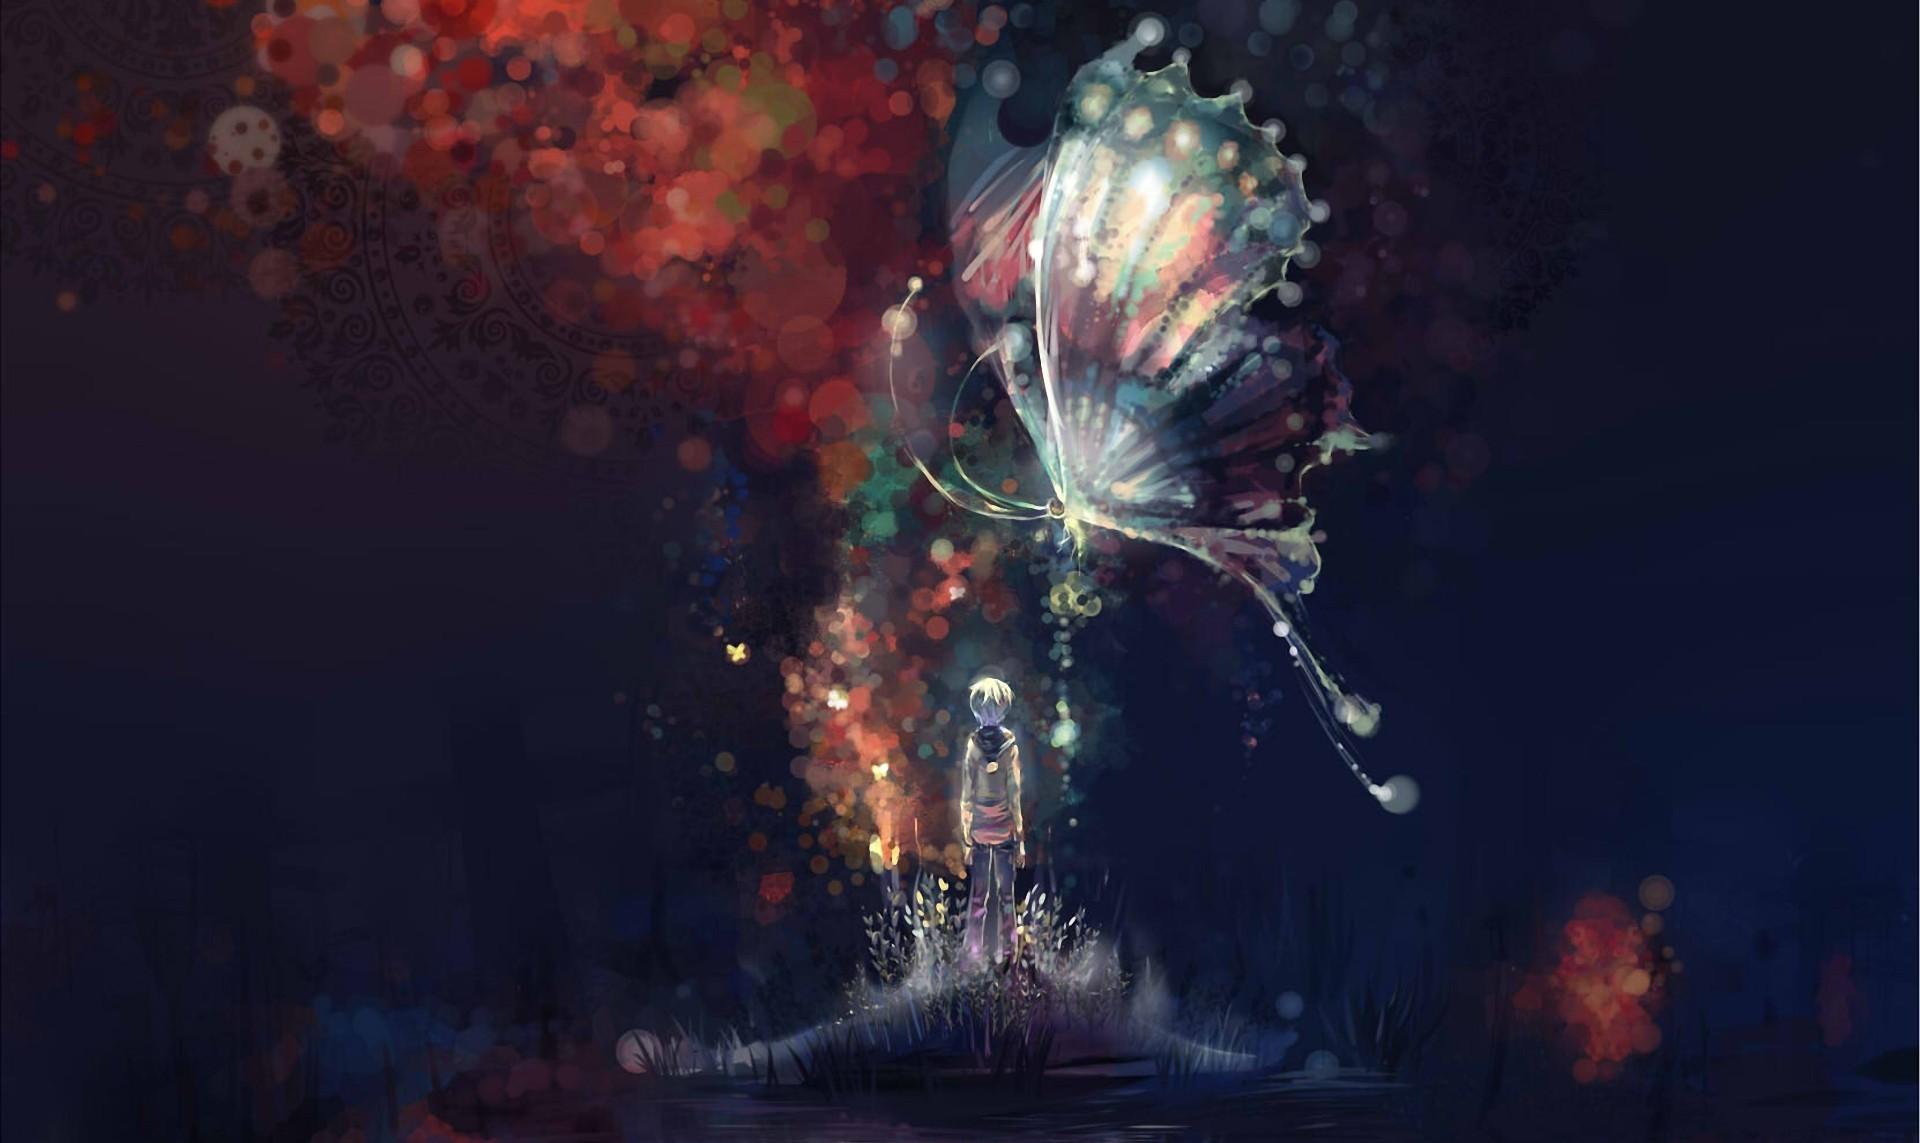 Art Night Abstract Butterfly Boy Island Water Lake Anime